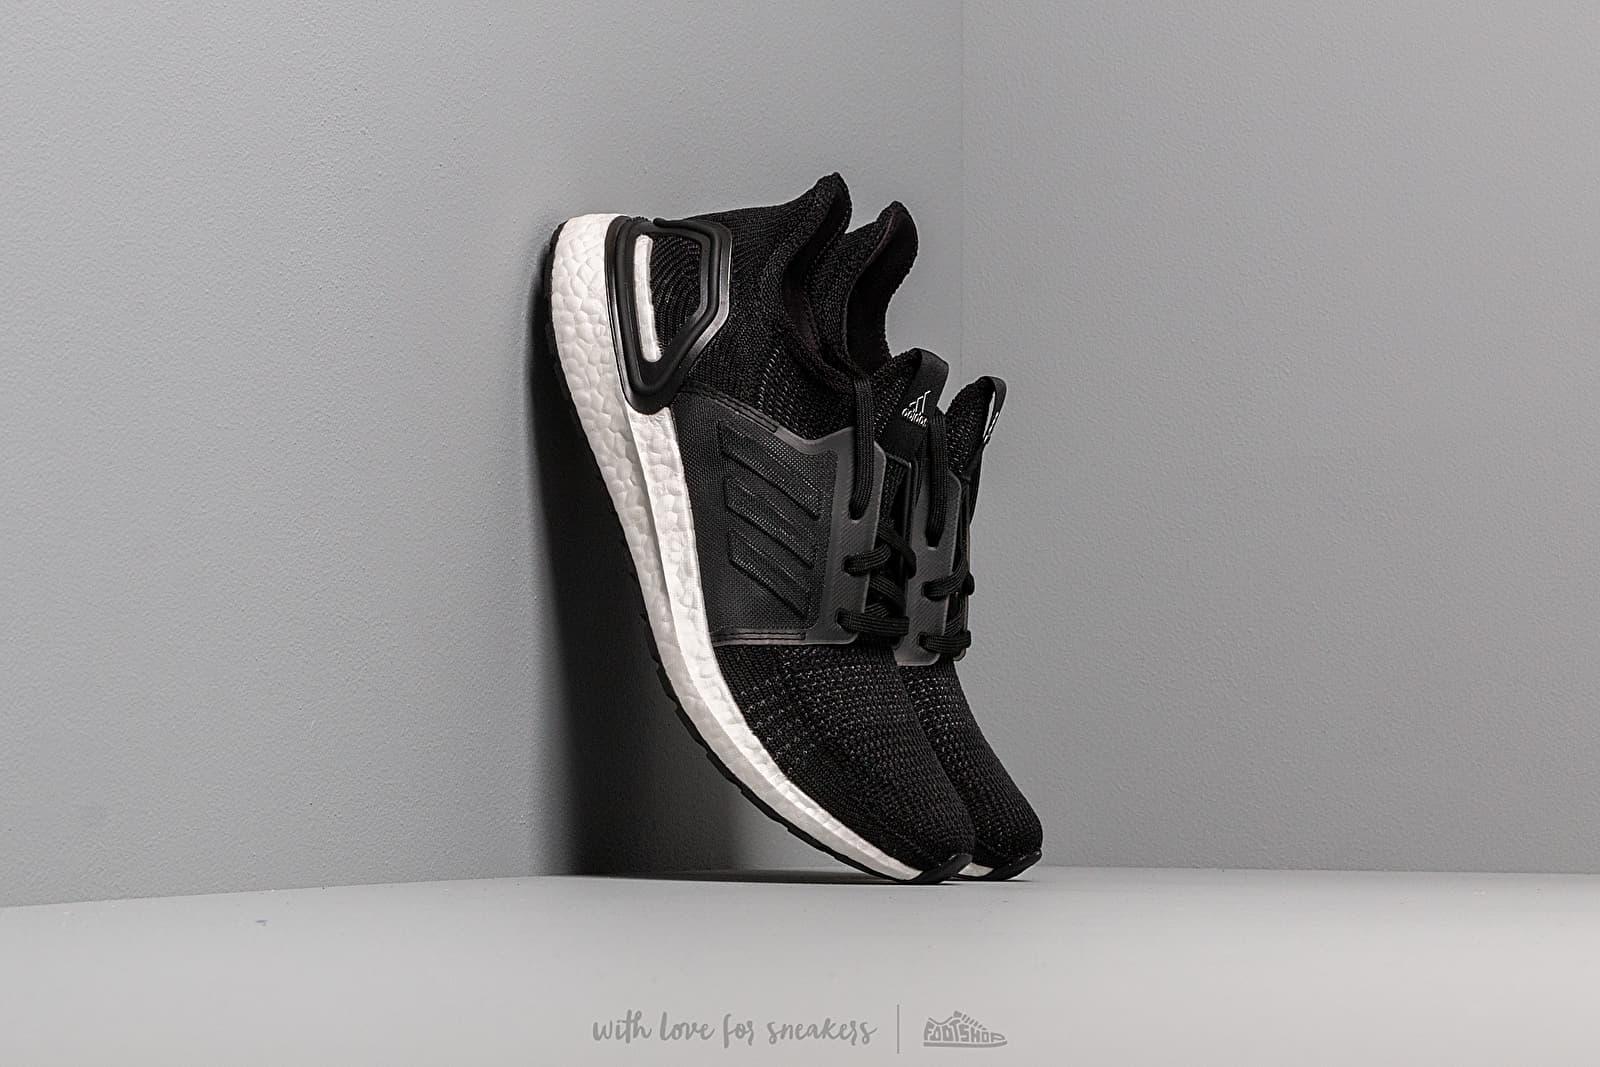 adidas UltraBOOST 19 m Core Black/ Core Black/ Ftwr White za skvelú cenu 157 € kúpite na Footshop.sk